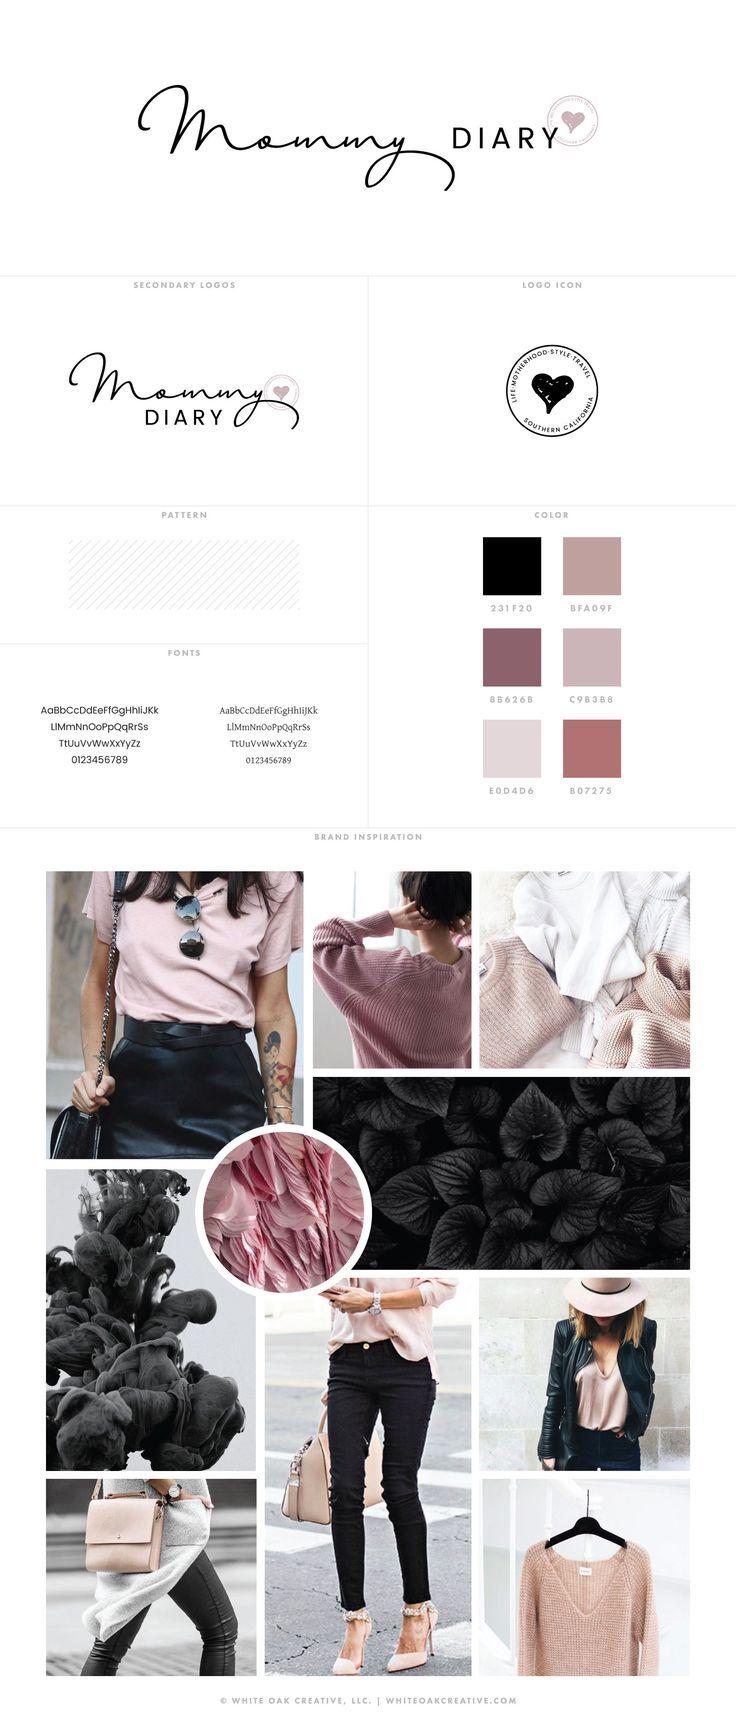 Blog Brand Identity For Mommy Diary Lifestyle Blog Designs Ideas Inspirations Fashion Logo Inspiration Blog Logo Design Fashion Logo Branding